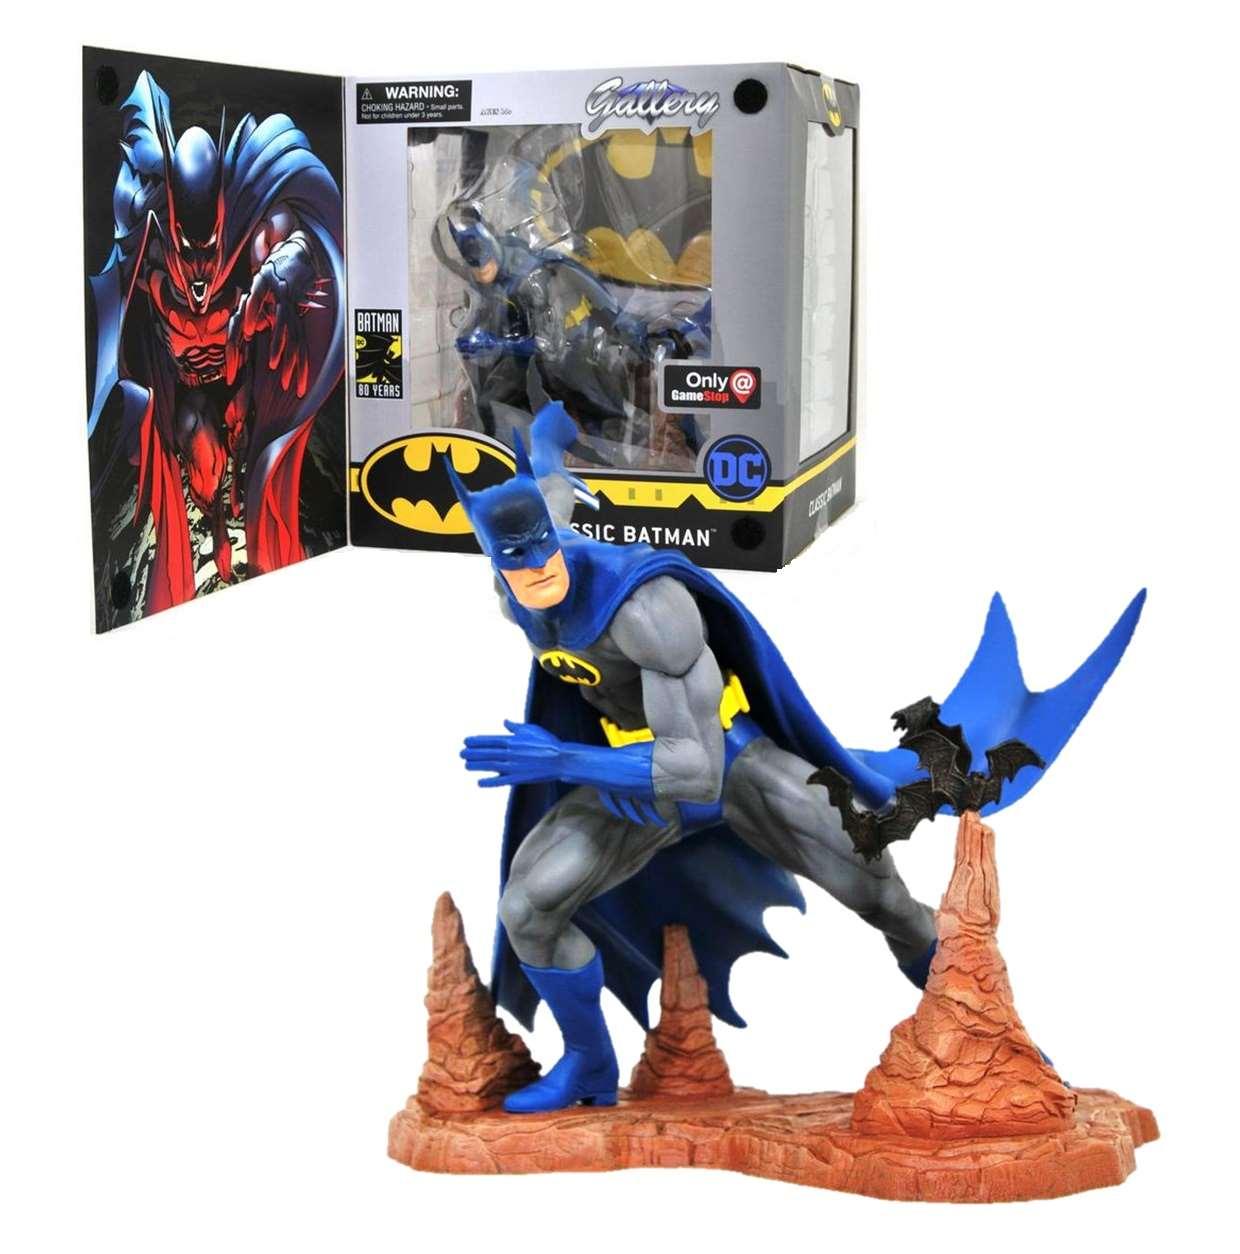 Batman Classic Figura Dc Comics Gallery Exclusivo Game Stop